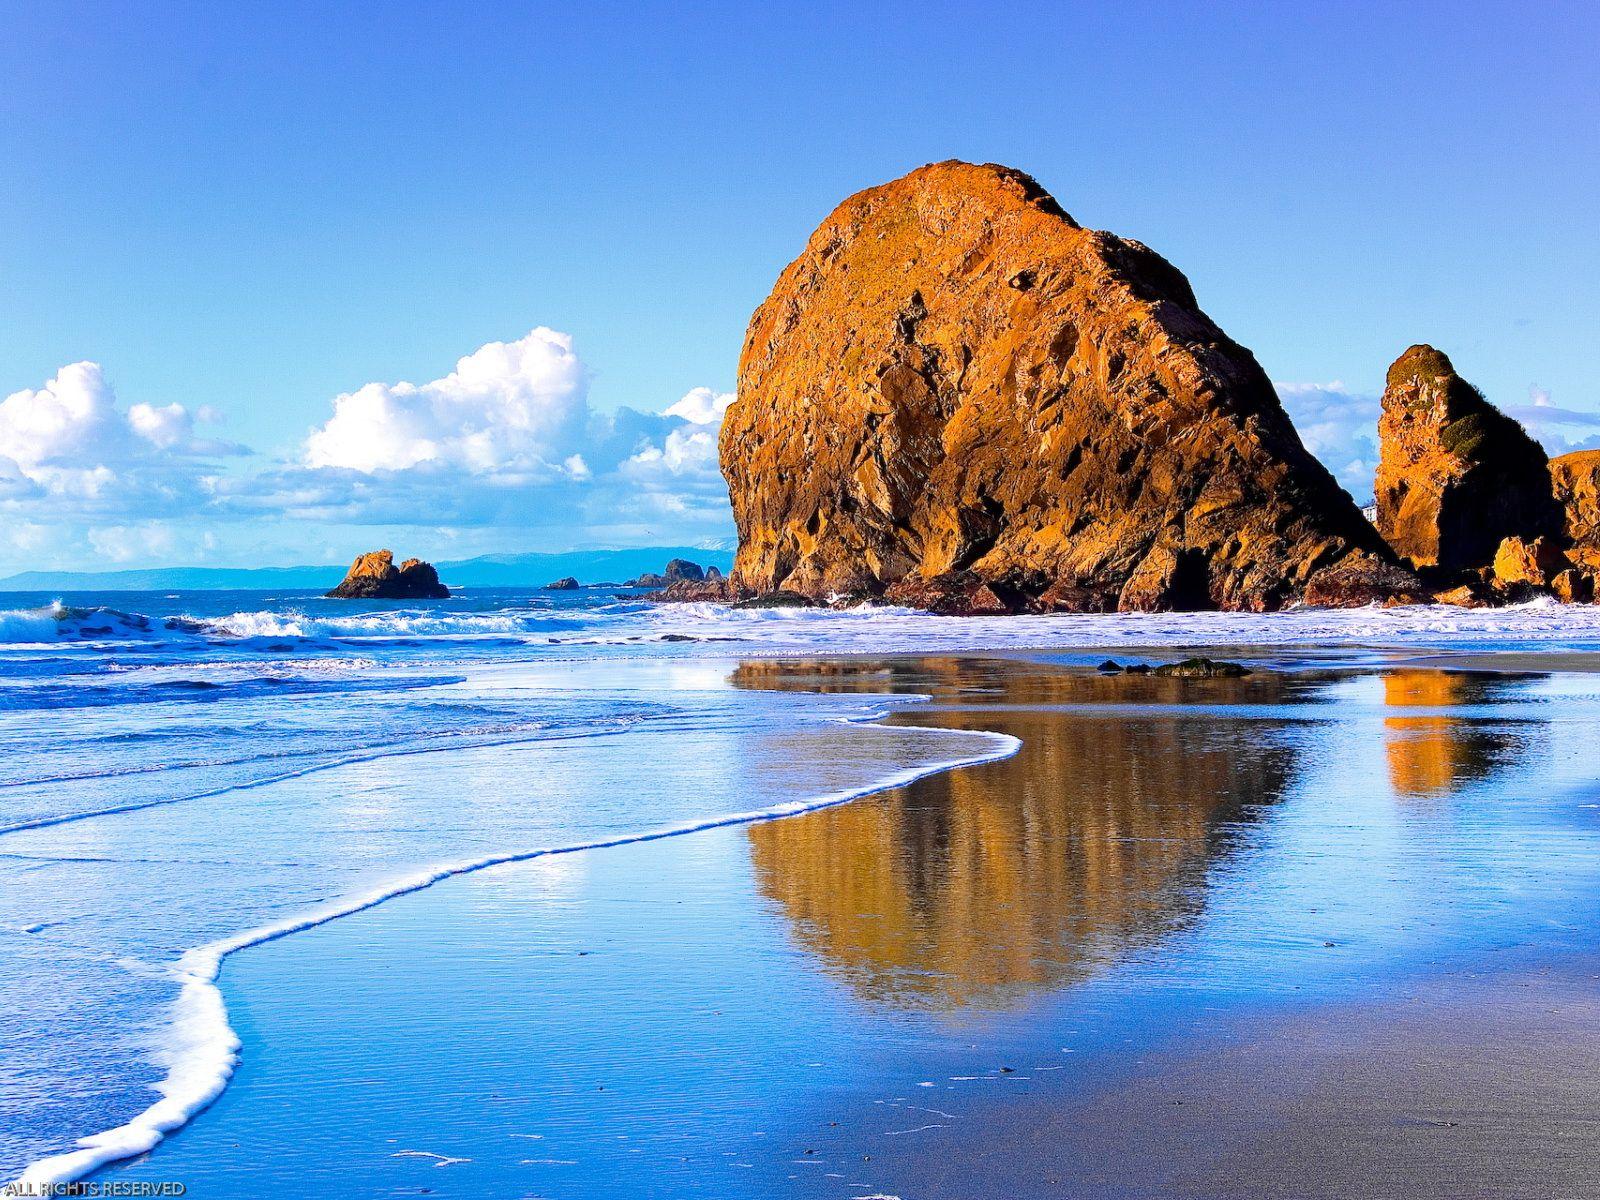 A Huge Rock At The Seaside Mirror In The Water Beautiful Nature Wallpaper Scenery Wallpaper Beautiful Landscape Wallpaper